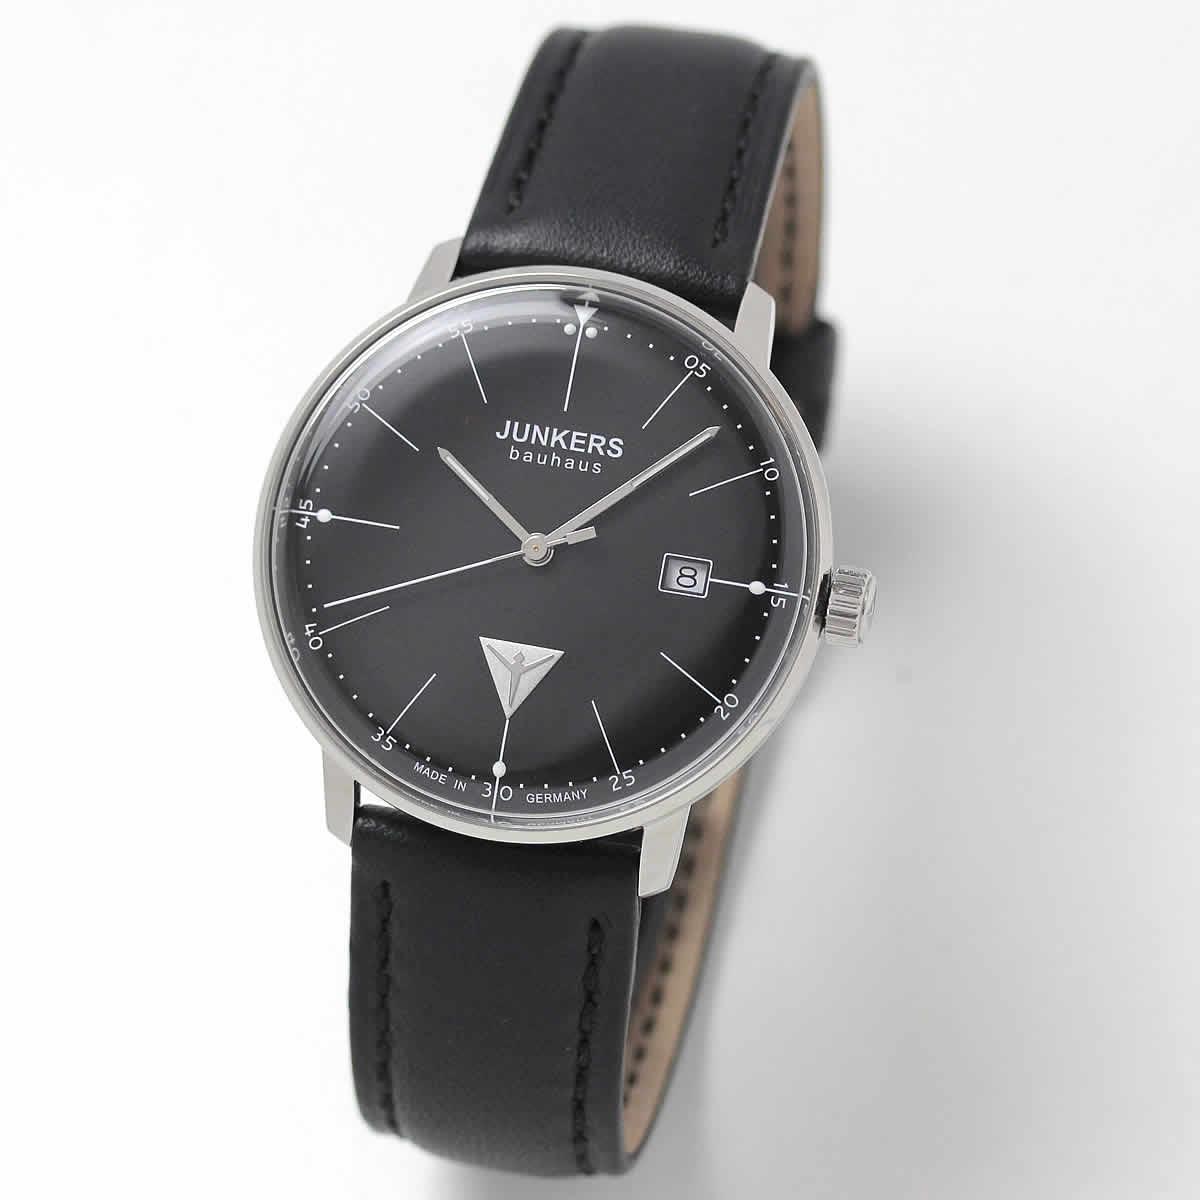 JUNKERS/ユンカース/Bauhaus(バウハウス)/Datum Date/6070-2QZ-203540/クォーツ/腕時計